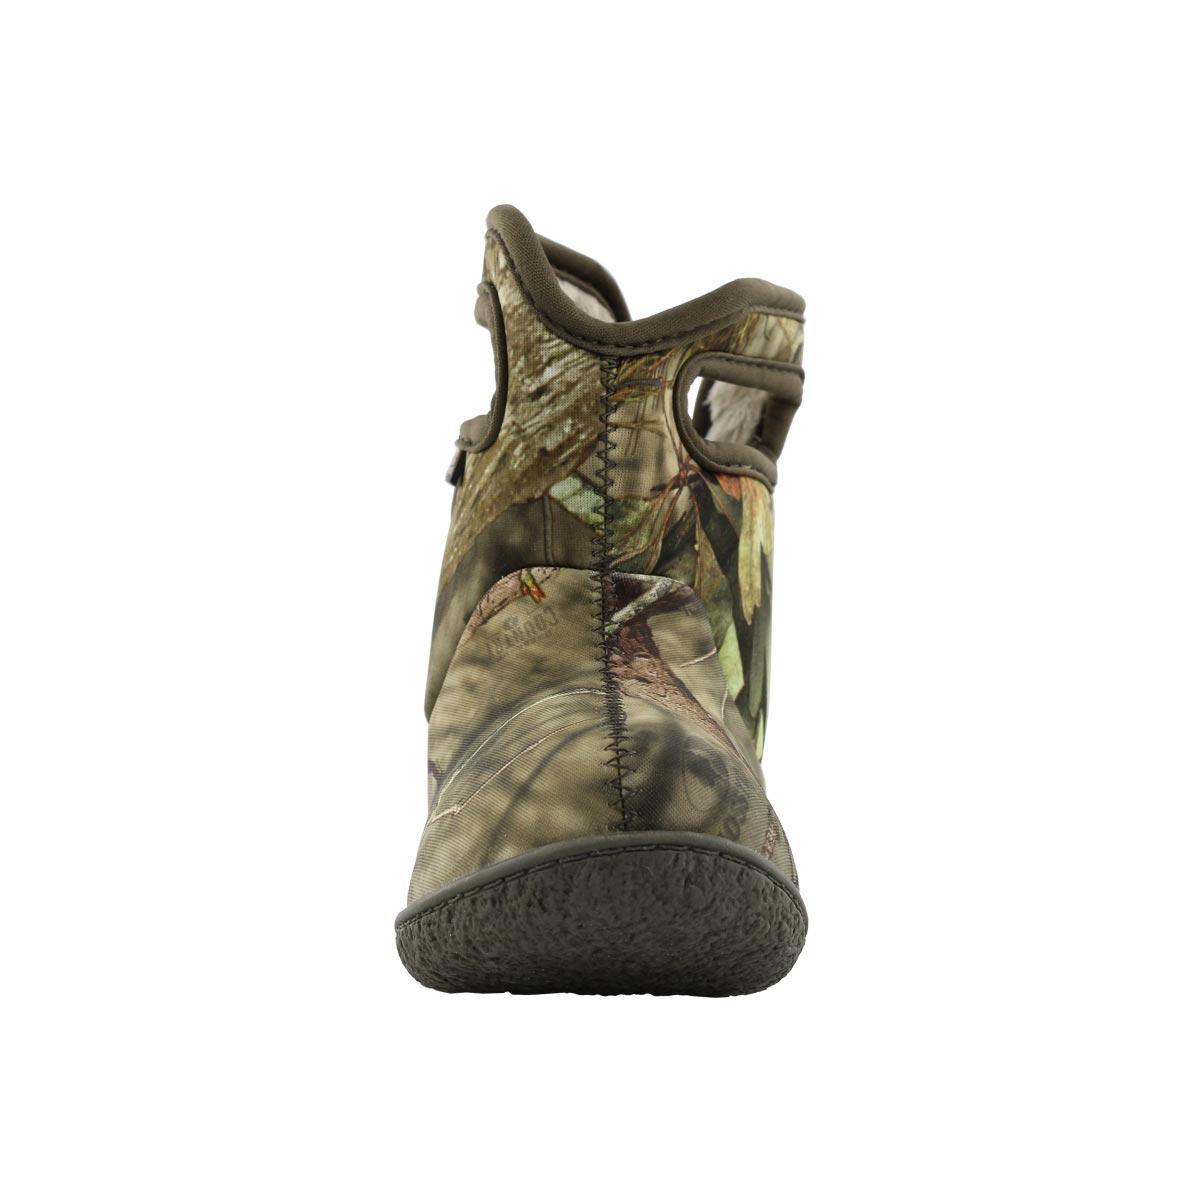 Inf-b Mossy Oak camo wtpf boot